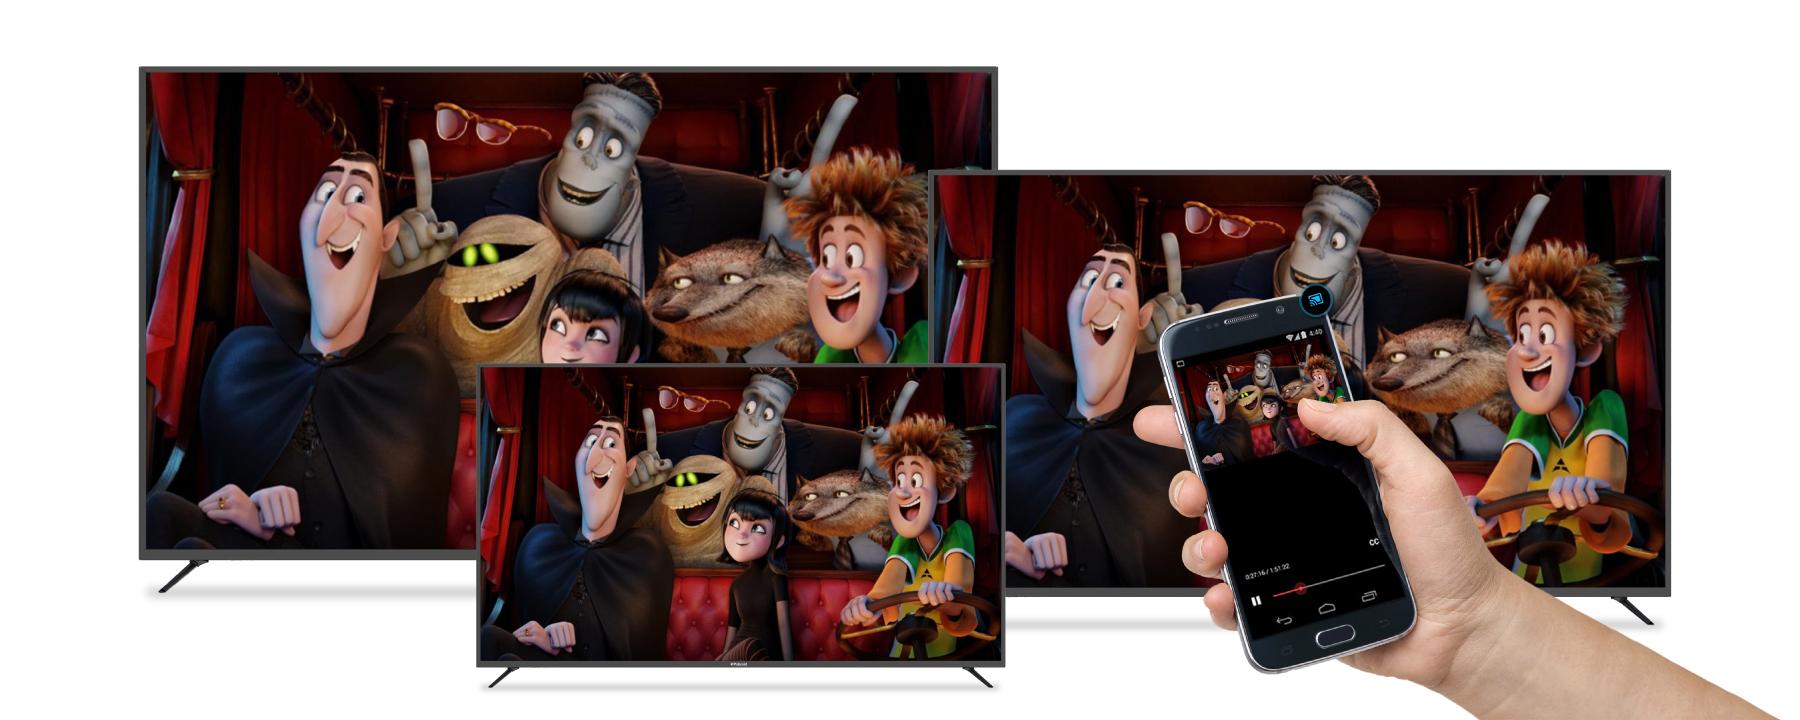 Polaroid 4K UHD LED TV with Google Cast